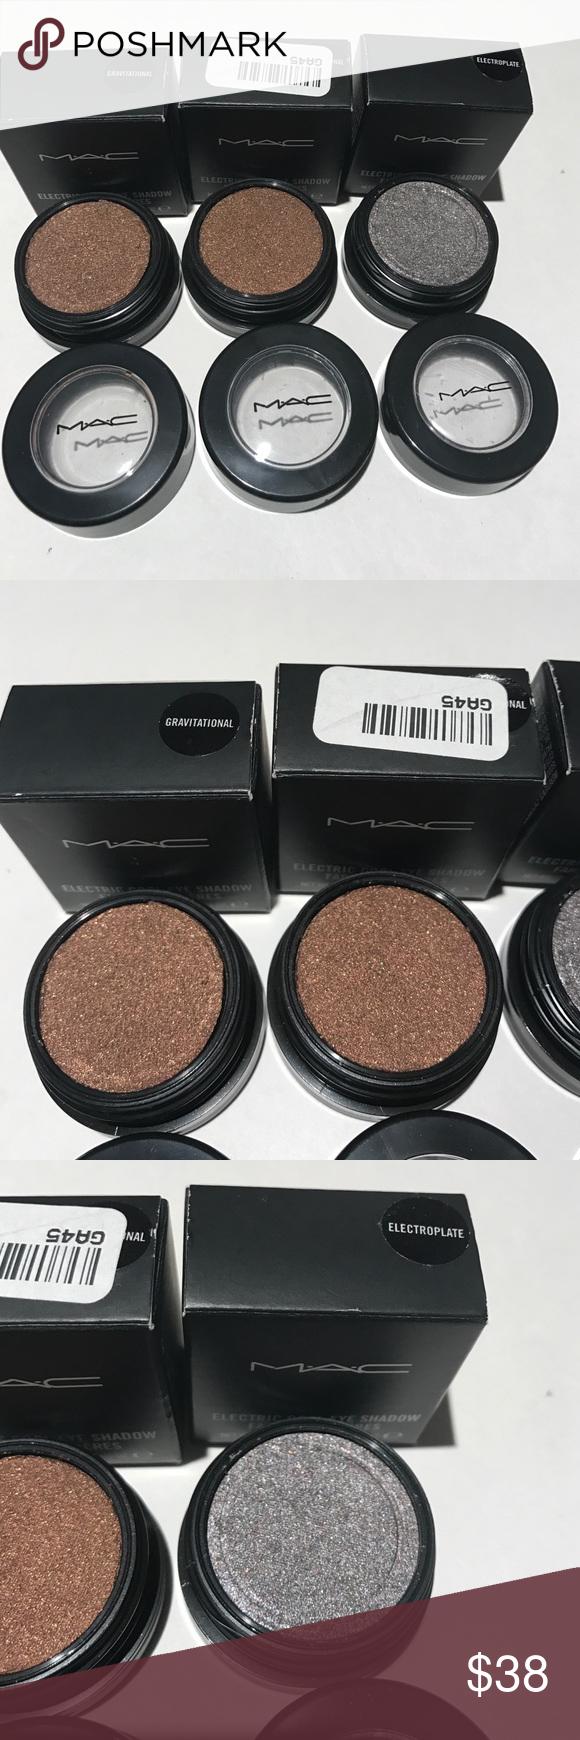 Mac electric cool eyeshadow bundle of 3 Mac electric cool eyeshadow bundle of 3. 2- gravitational and 1- electroplate MAC Cosmetics Makeup Eyeshadow